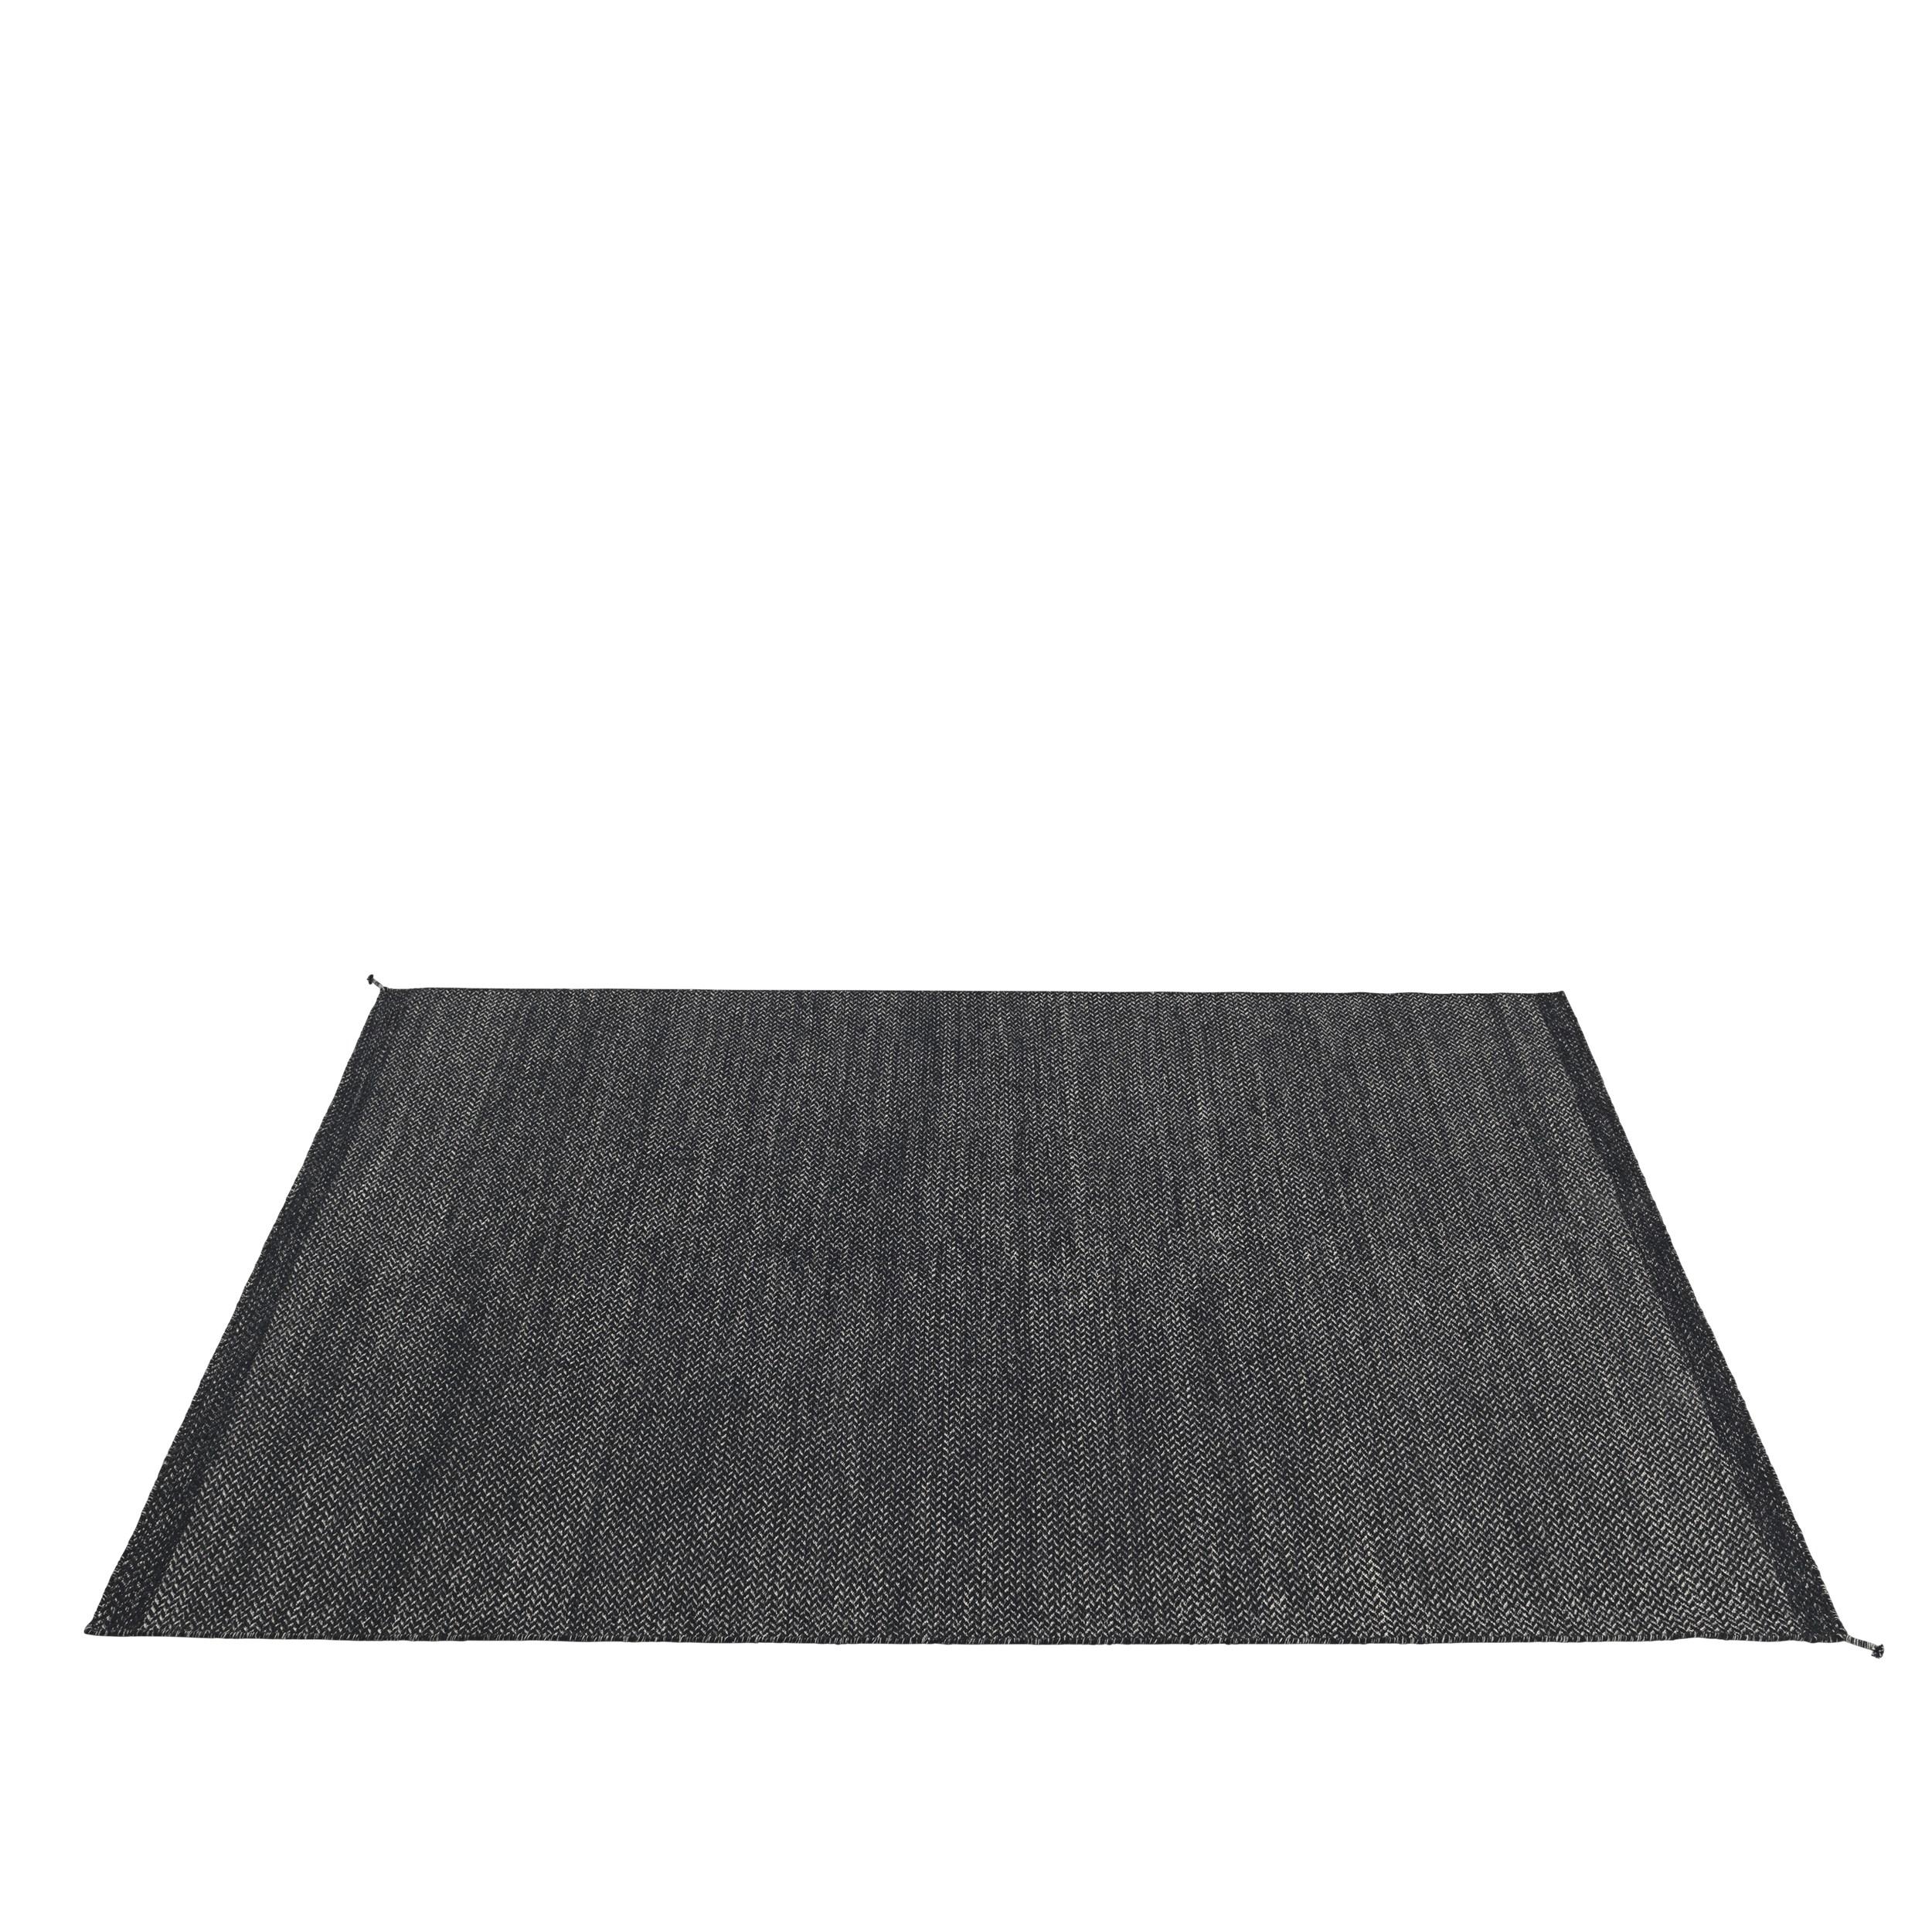 Ply rug 270 x 360 midnight blue